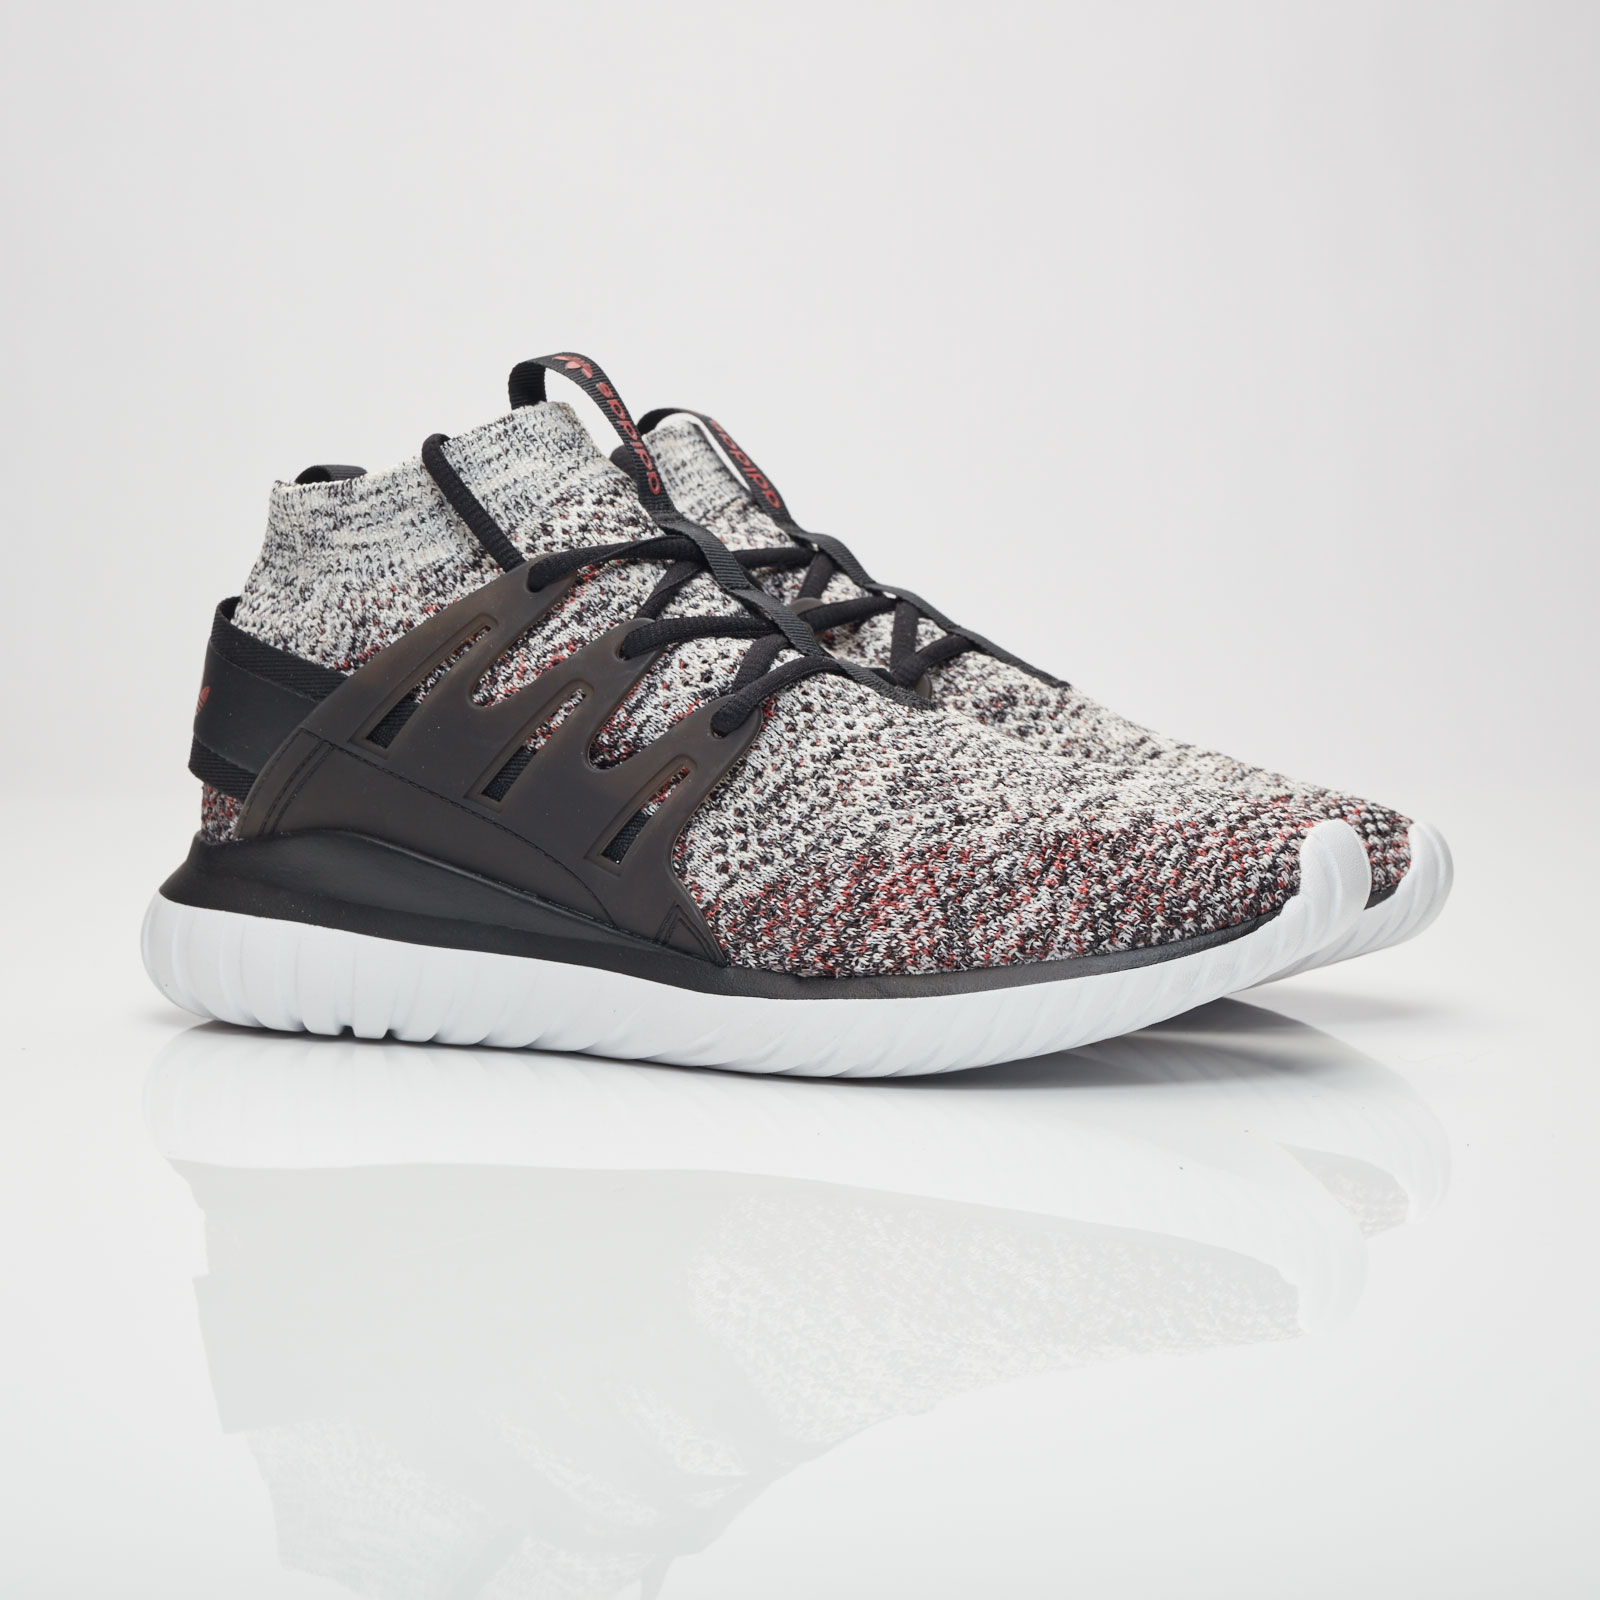 adidas Tubular Nova PK - Bb8409 - SNS | sneakers & streetwear ...